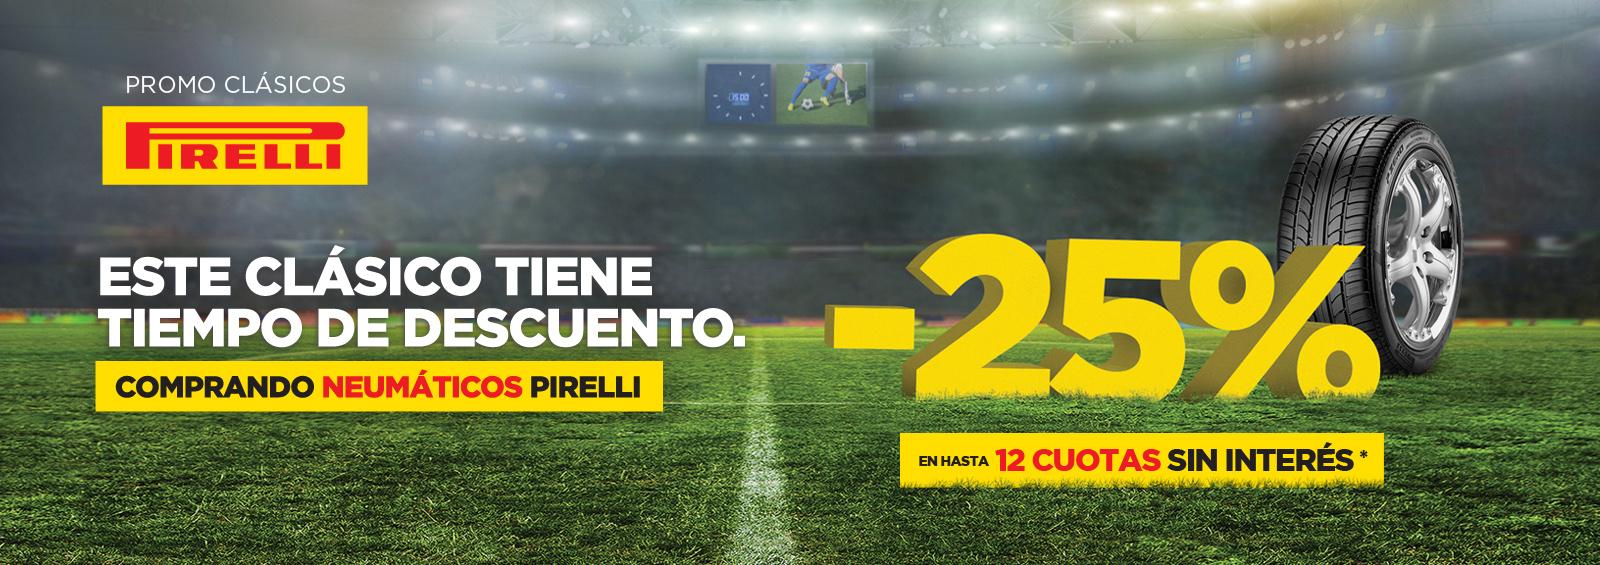 Promo Pirelli Clásicos